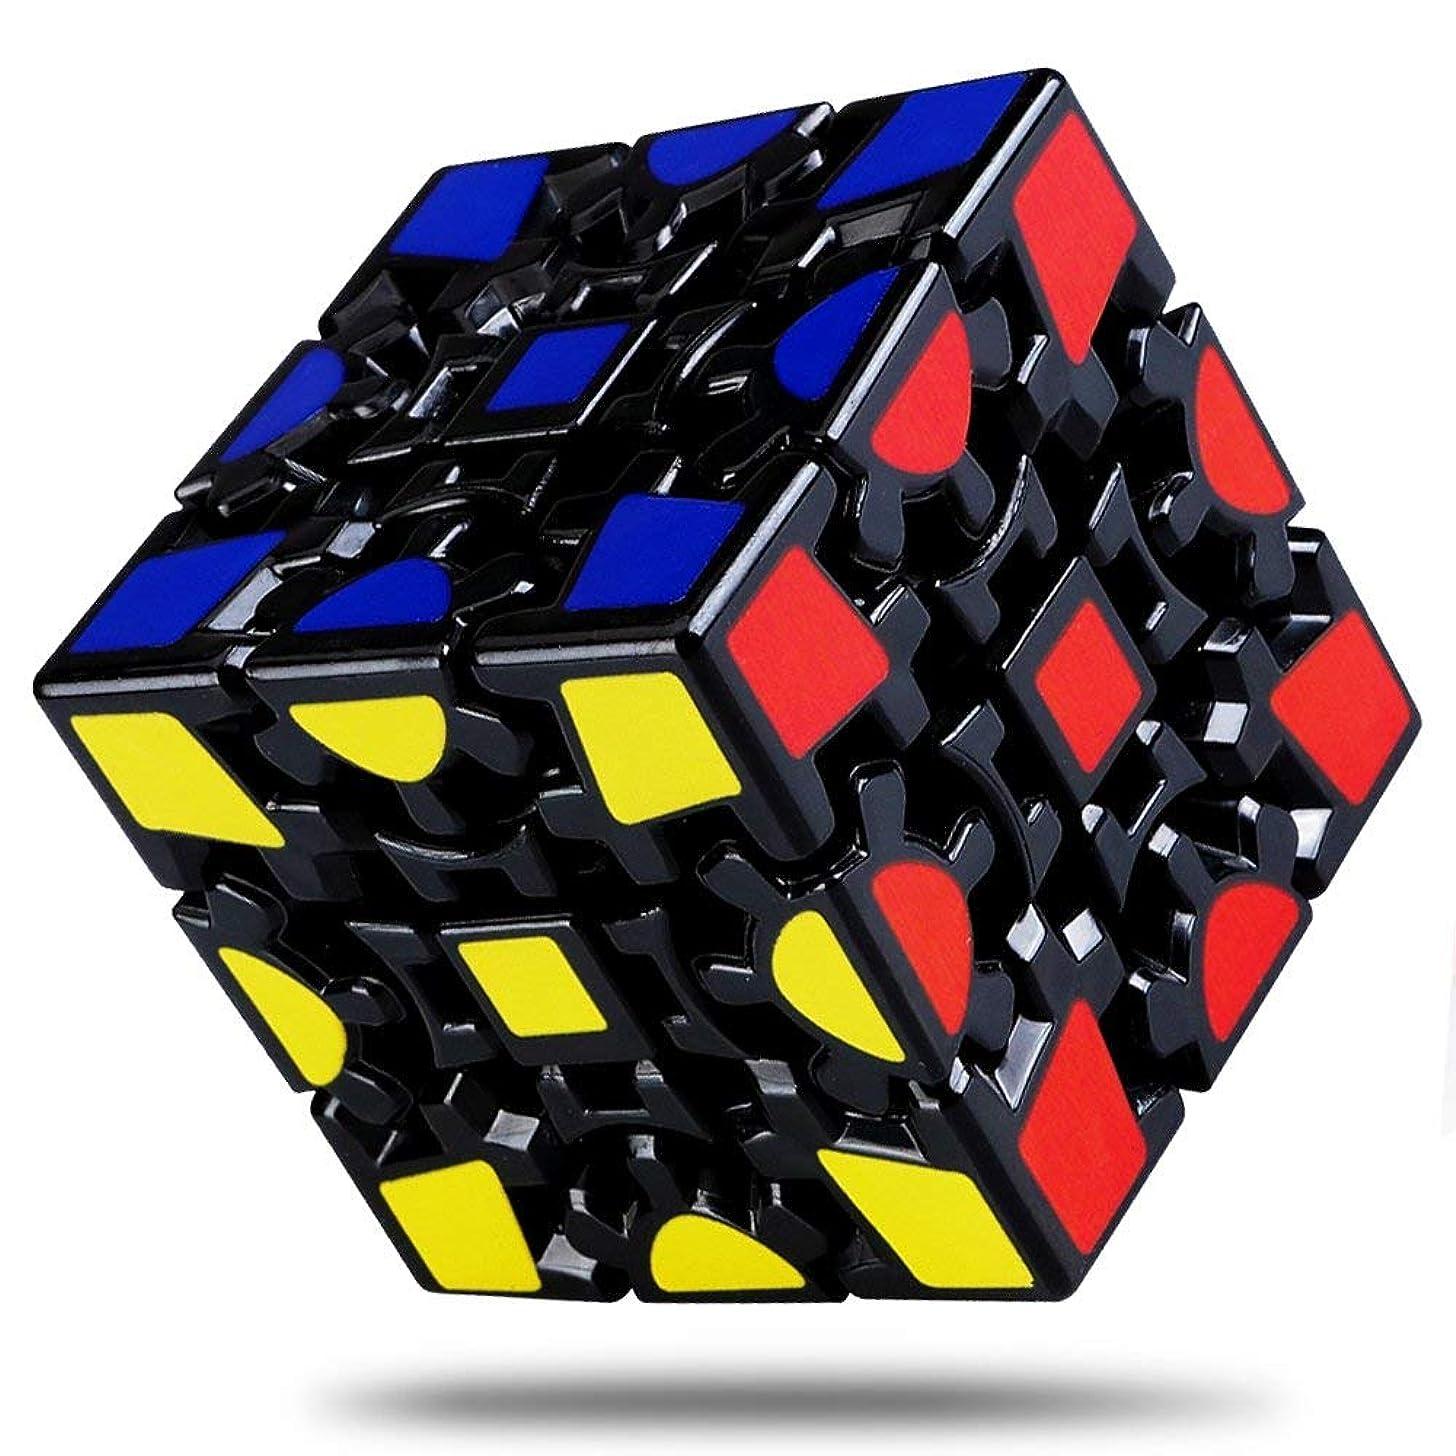 Wannabuy Magic Combination 3D Rubiks Gear Cube, 3x3 Match-specific Rubiks Cube Stickerless Twisty Puzzle